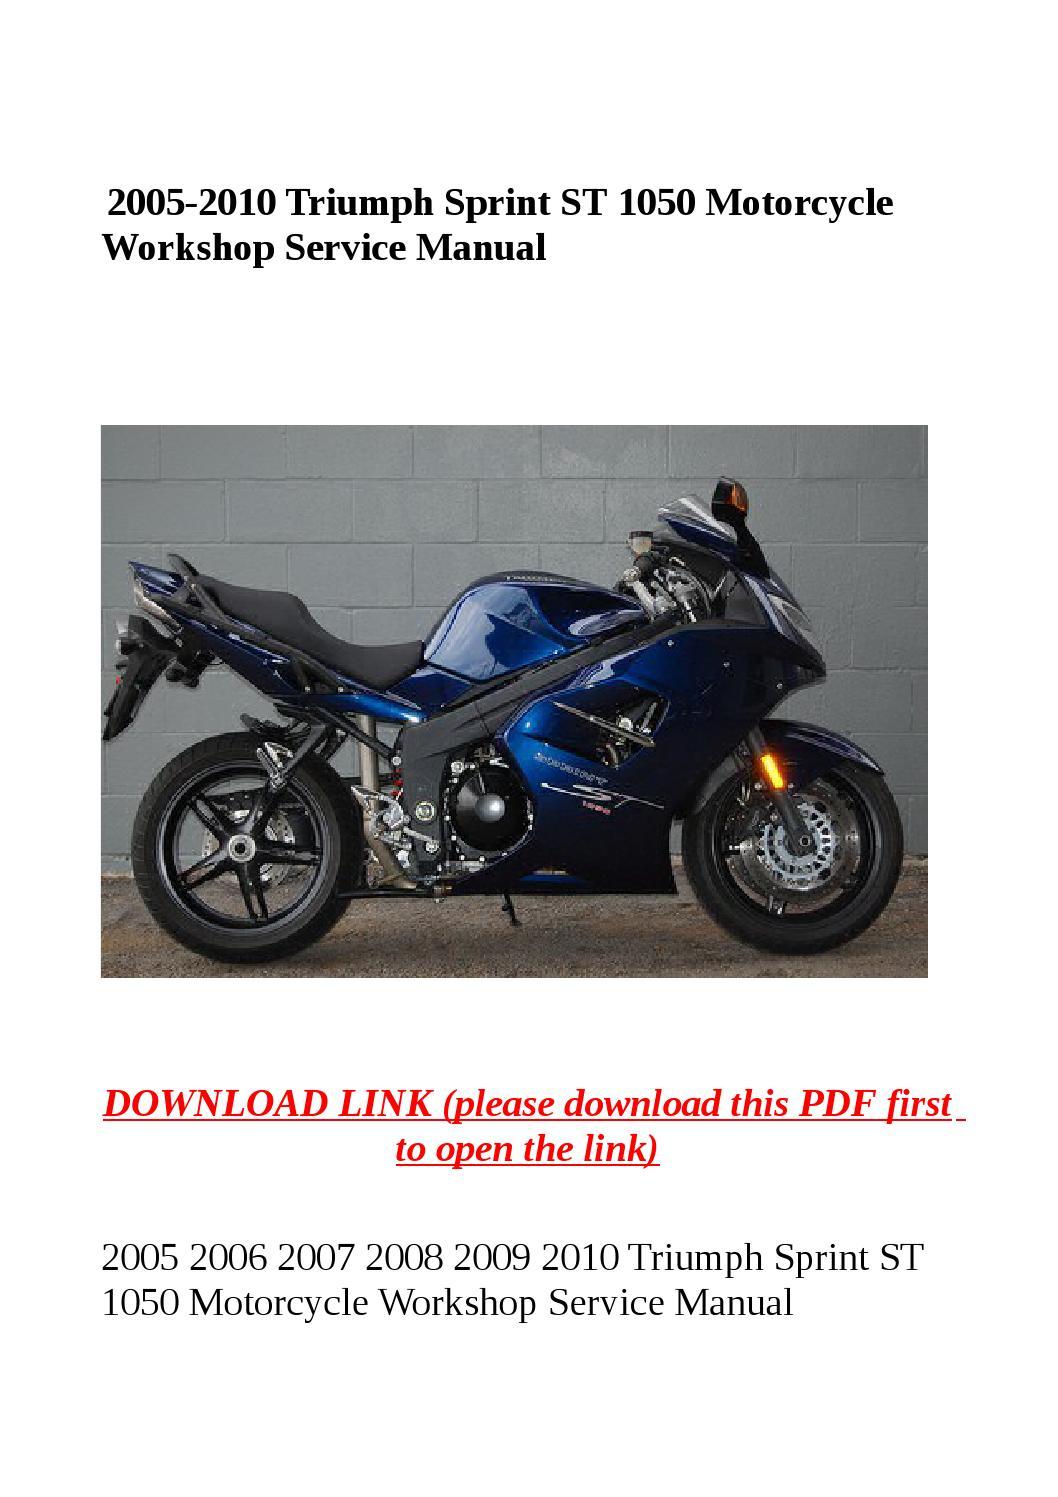 2005 2010 triumph sprint st 1050 motorcycle workshop